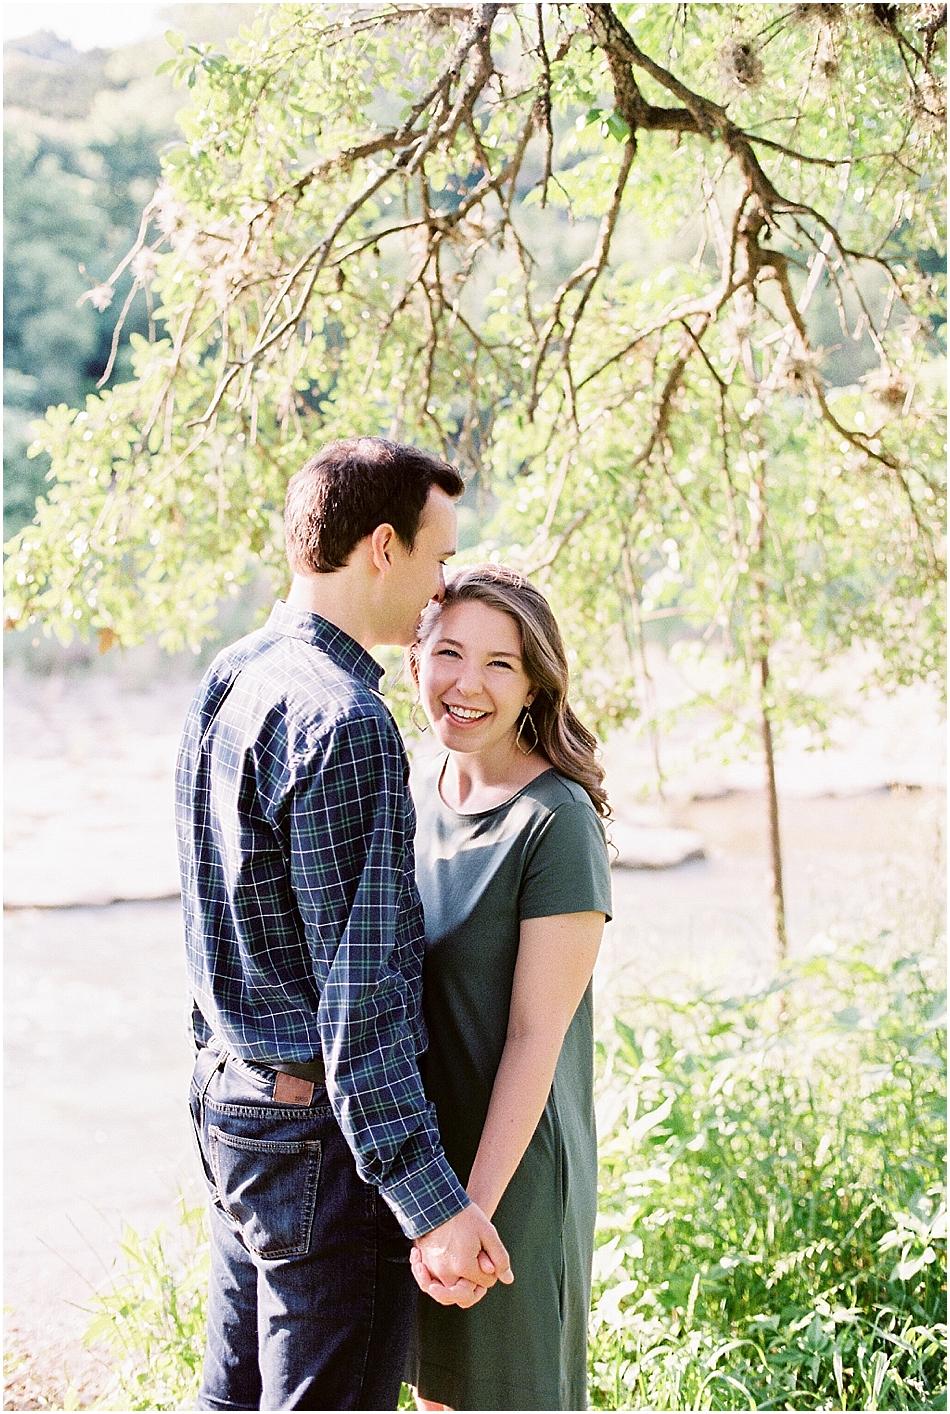 Laura + Nick | Engagement | Fine Art Film | Austin Texas | Emilie Anne Photography-5.jpg